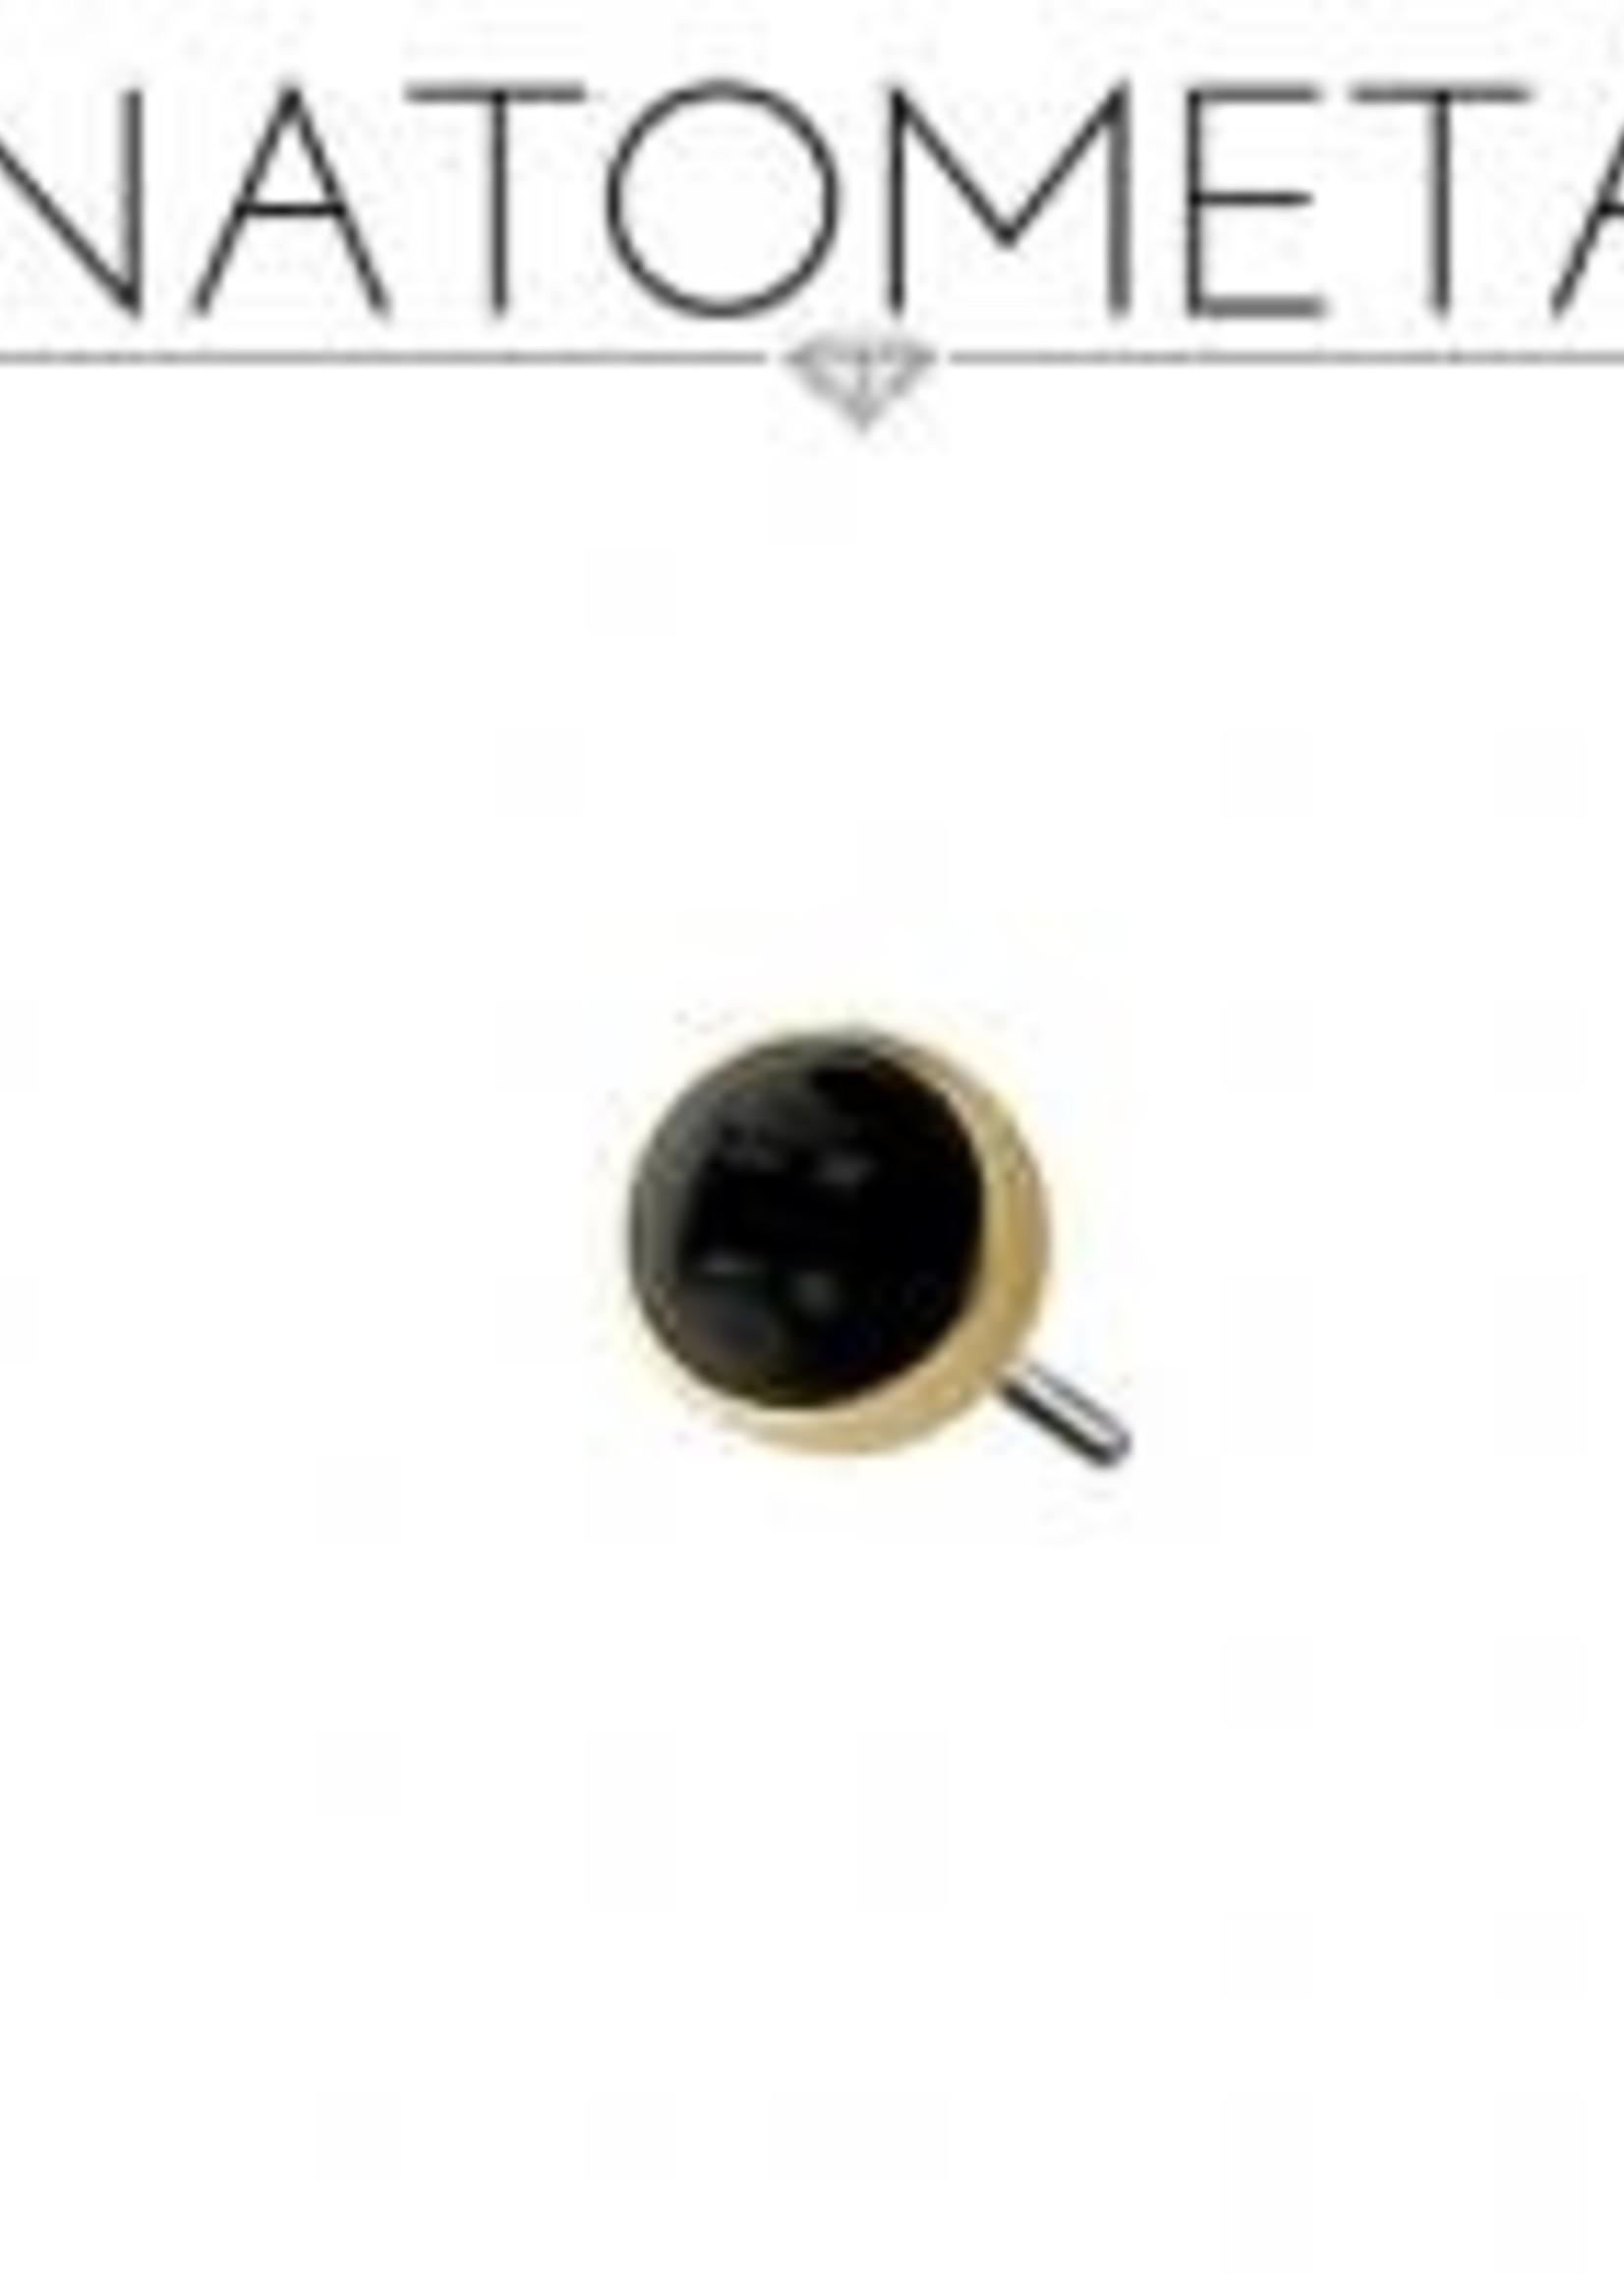 18k 4mm YG Bezel Threadless Pin